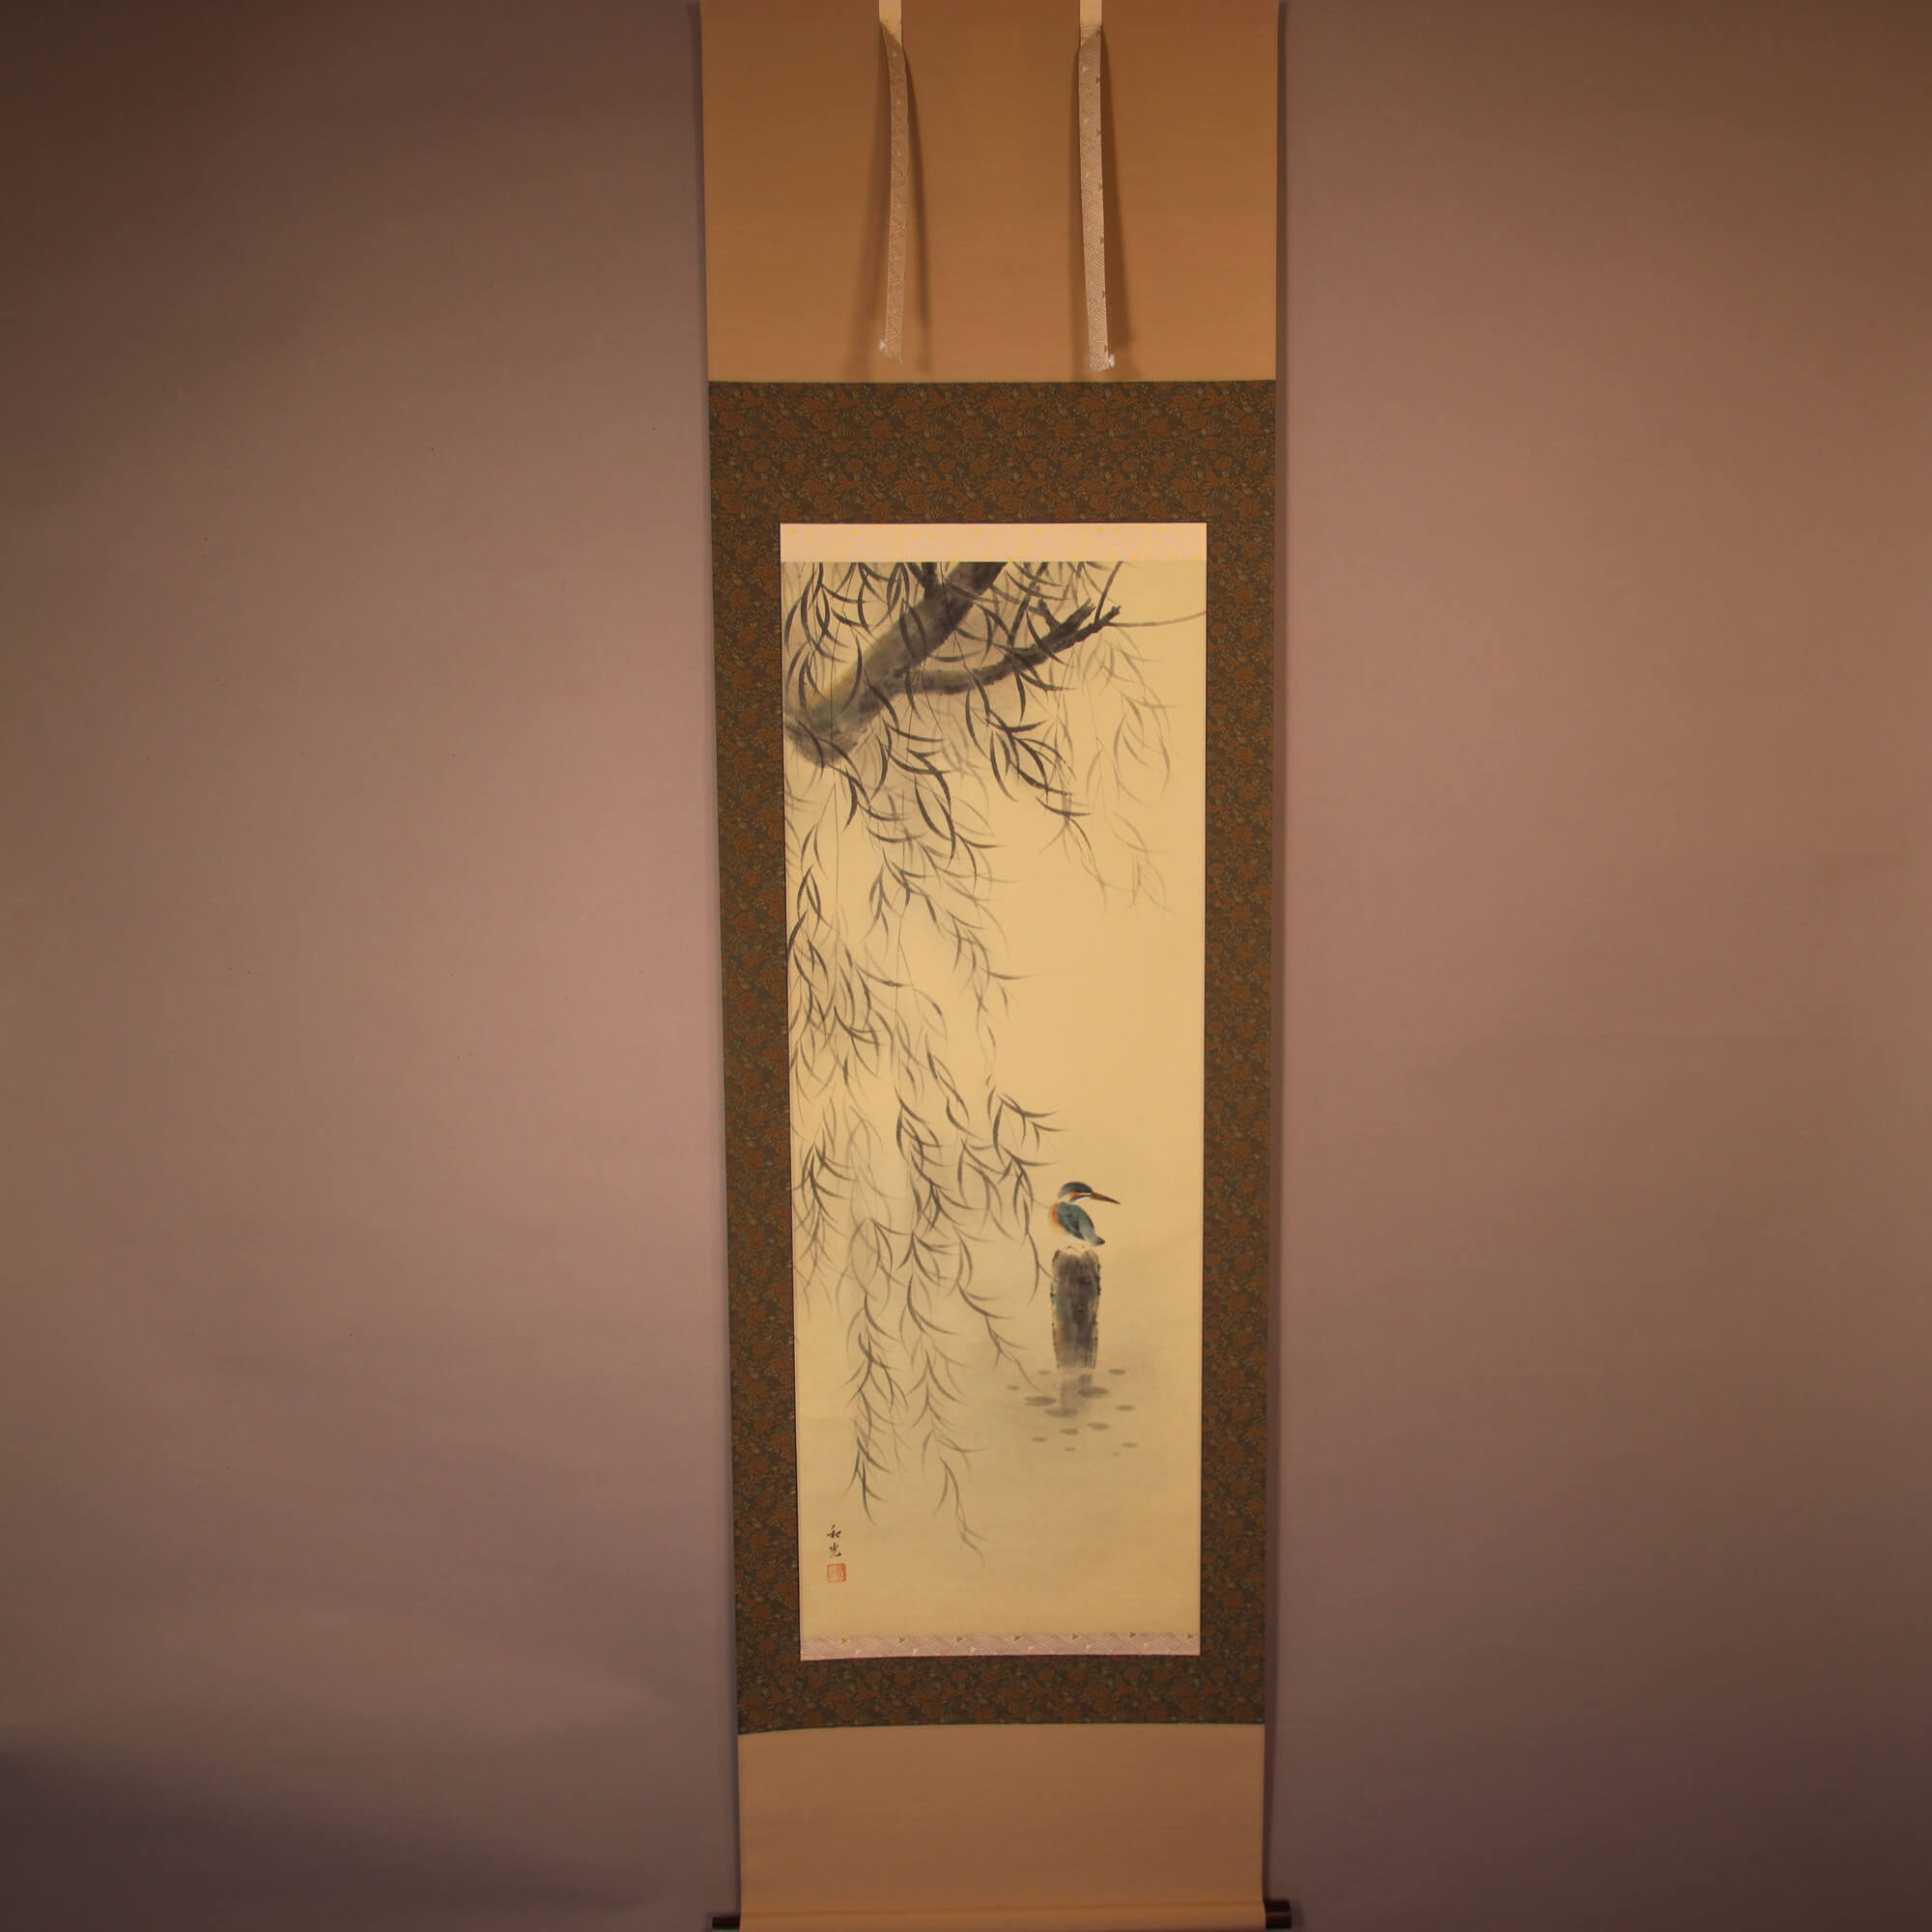 Willow Trees and a Kingfisher / Miyake Wakō